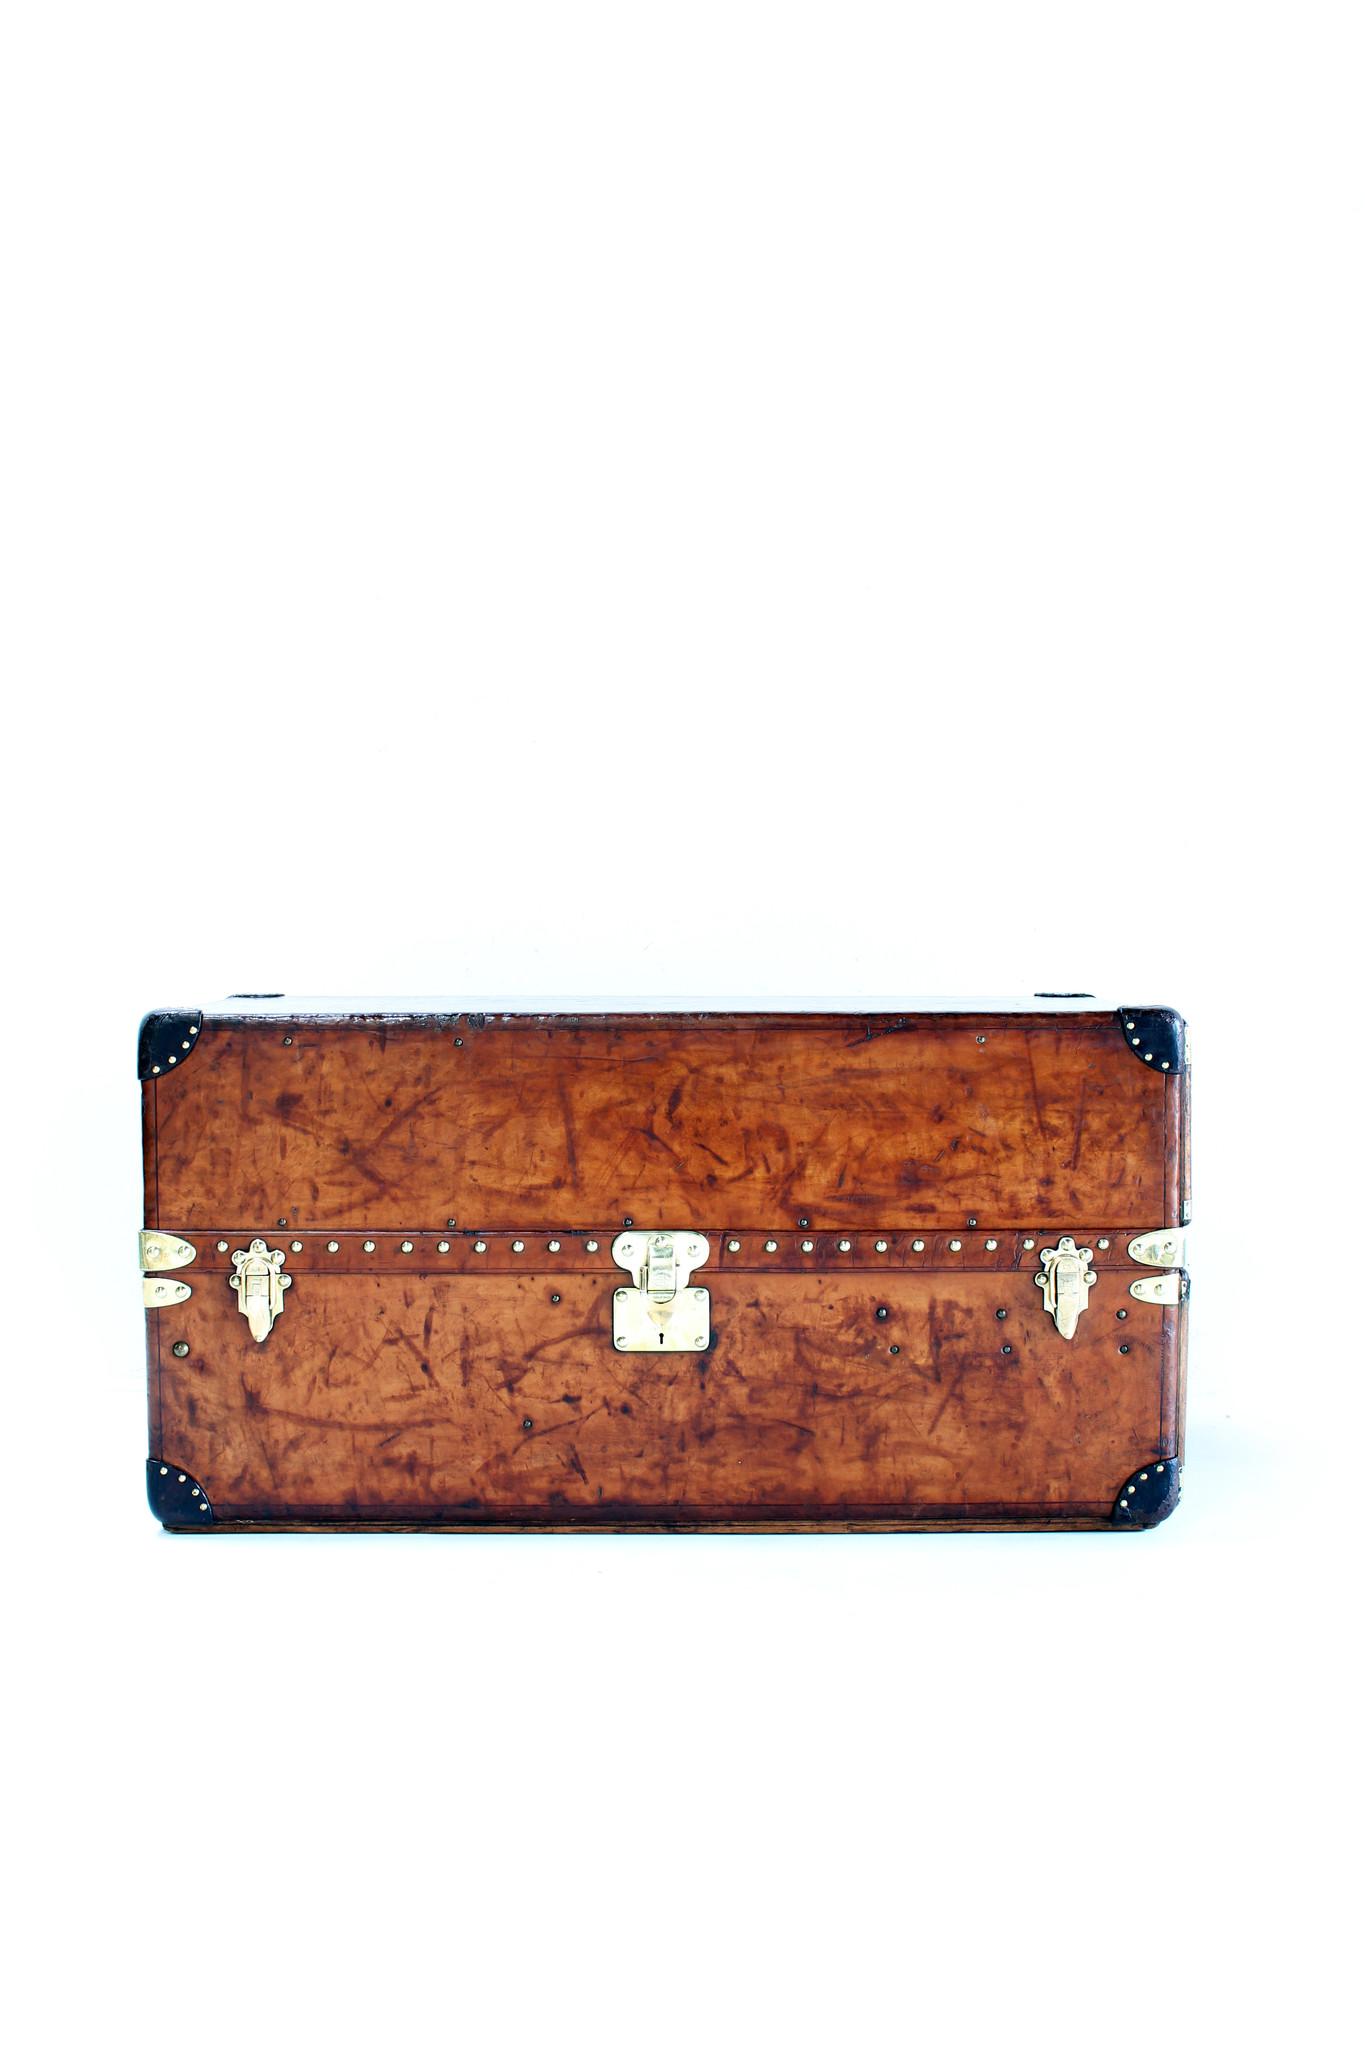 Lederen Louis Vuitton garderobe koffer, 1920's